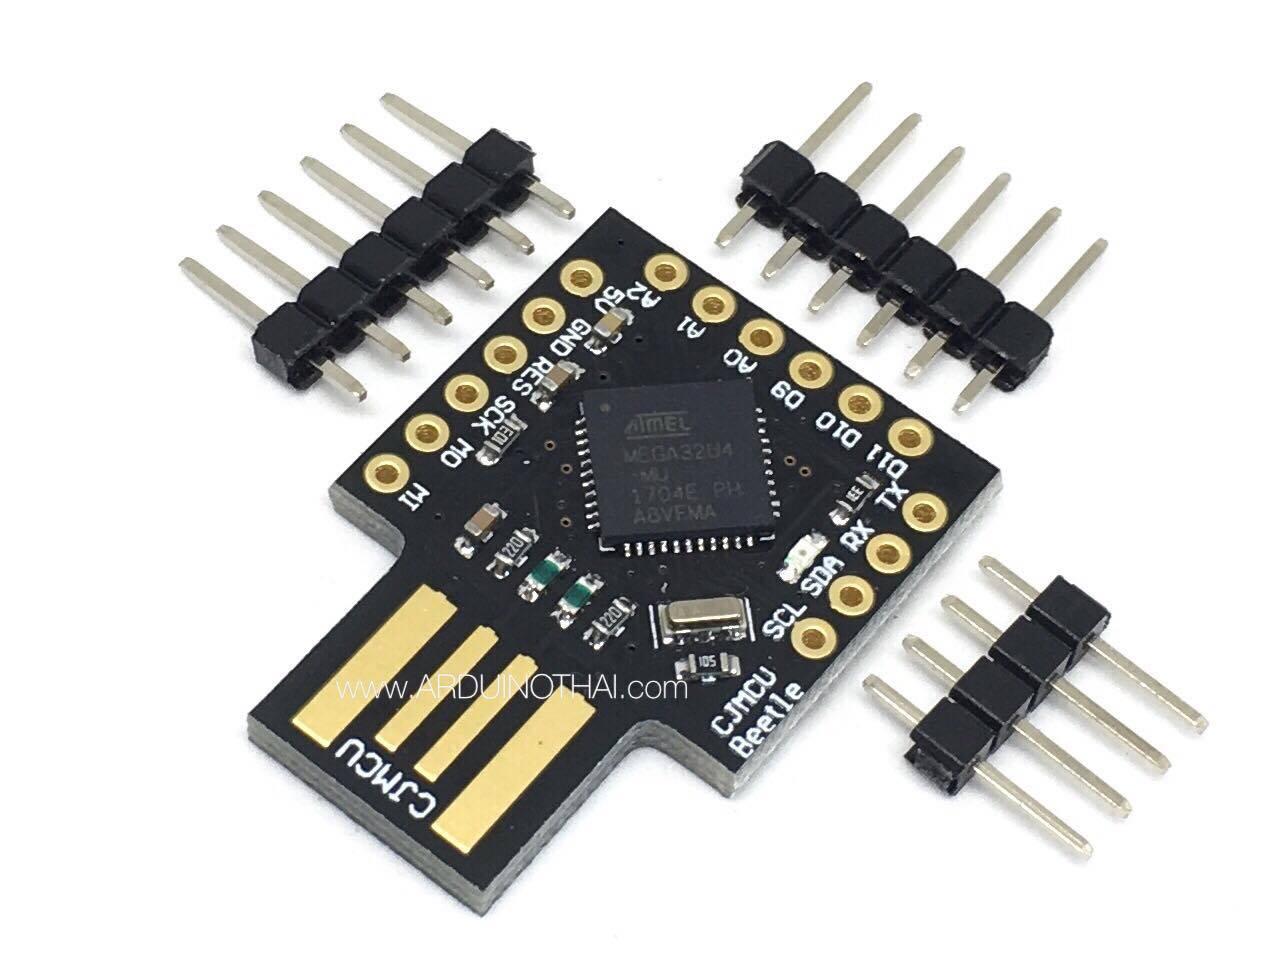 Leonardo USB ATMEGA32U4 virtual keyboard